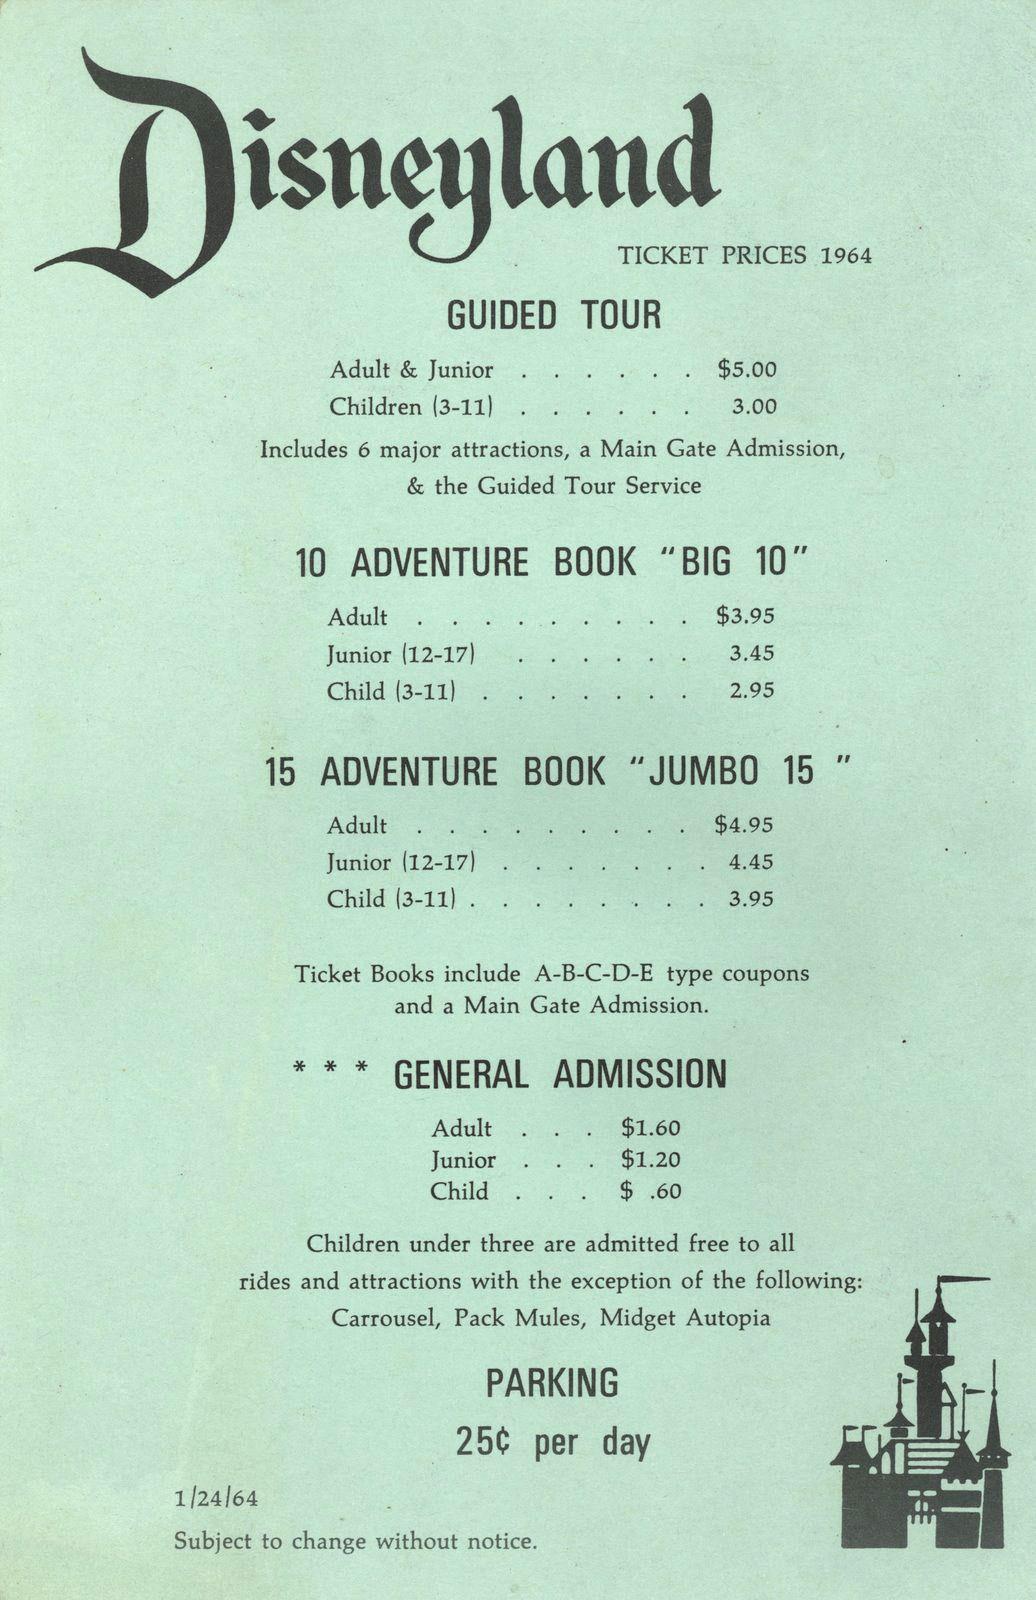 Ralphs Motorbike — yourland: Disneyland ticket stubs